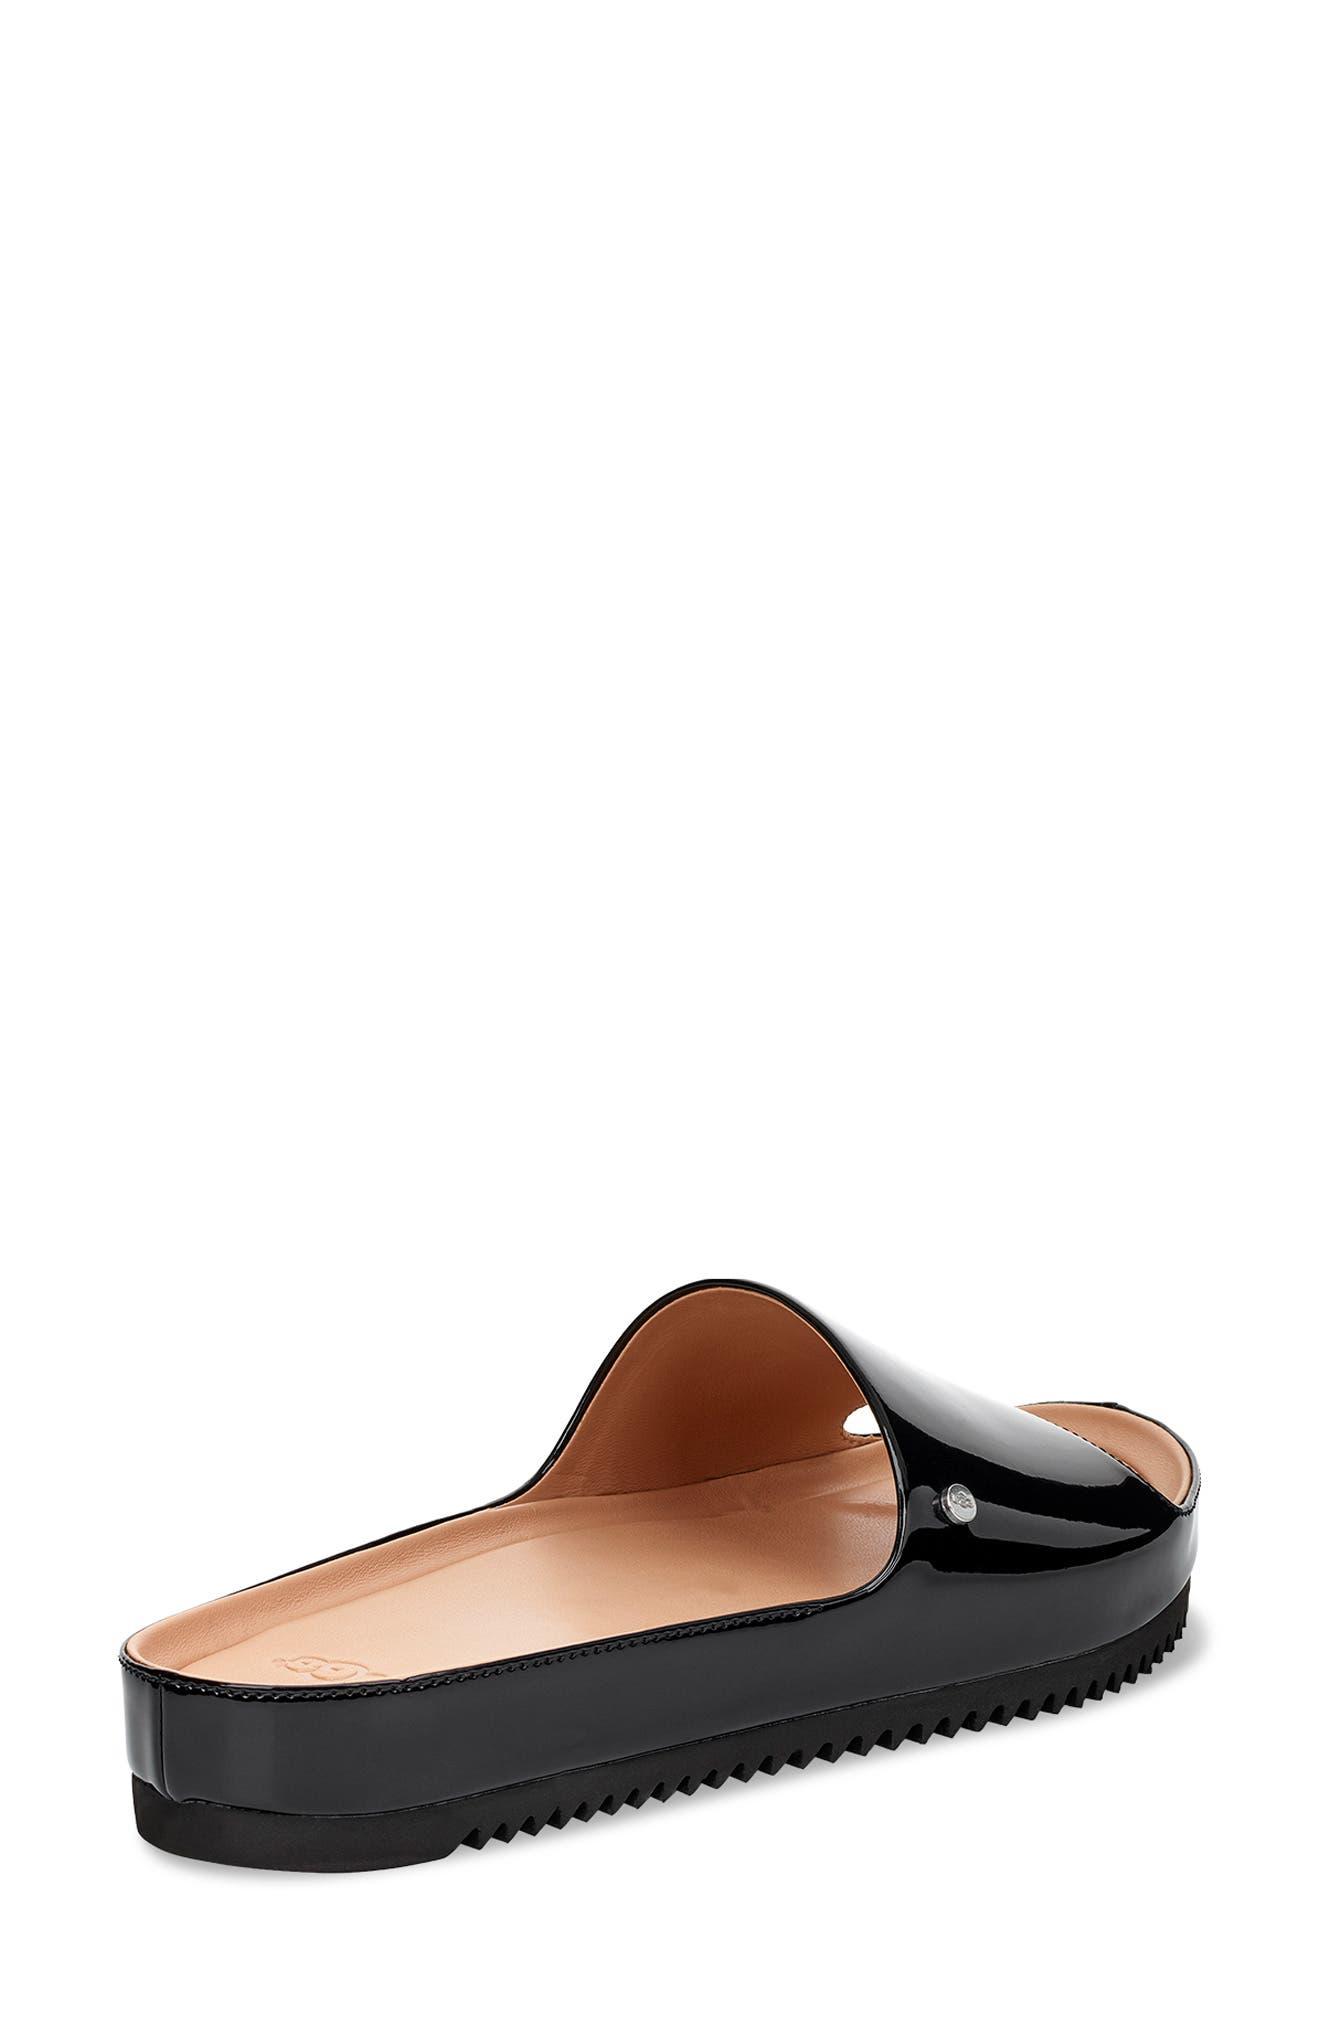 Jane Platform Slide Sandal,                             Alternate thumbnail 2, color,                             BLACK PATENT LEATHER